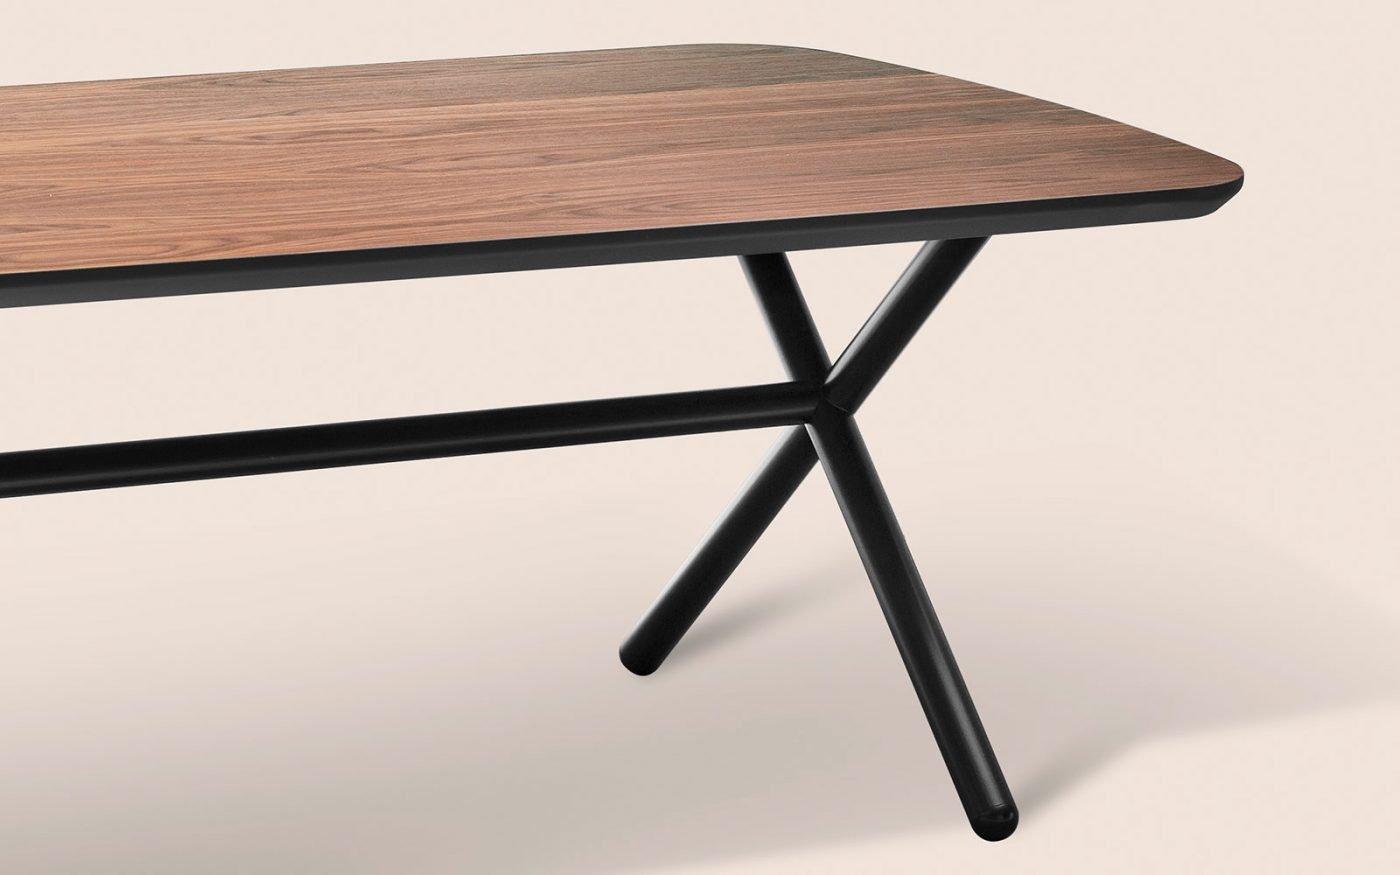 Emile Dining Table leg - misinforms